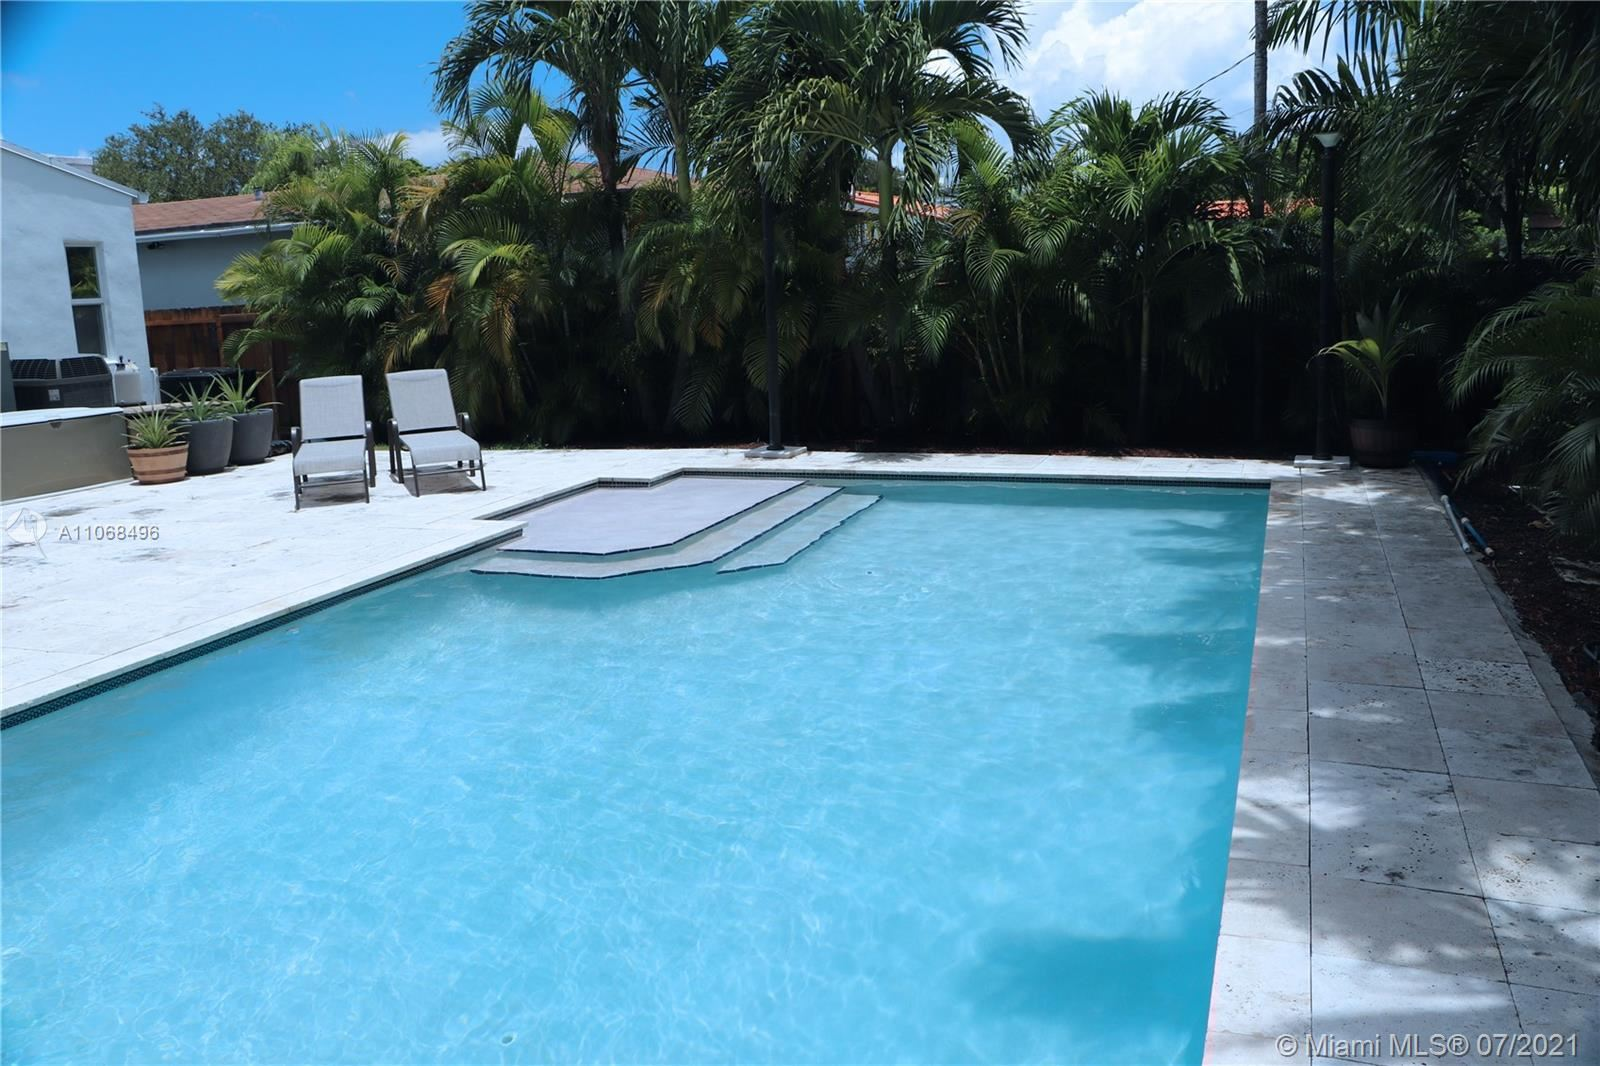 Photo of 646 W 51st St, Miami Beach, FL 33140 (MLS # A11068496)